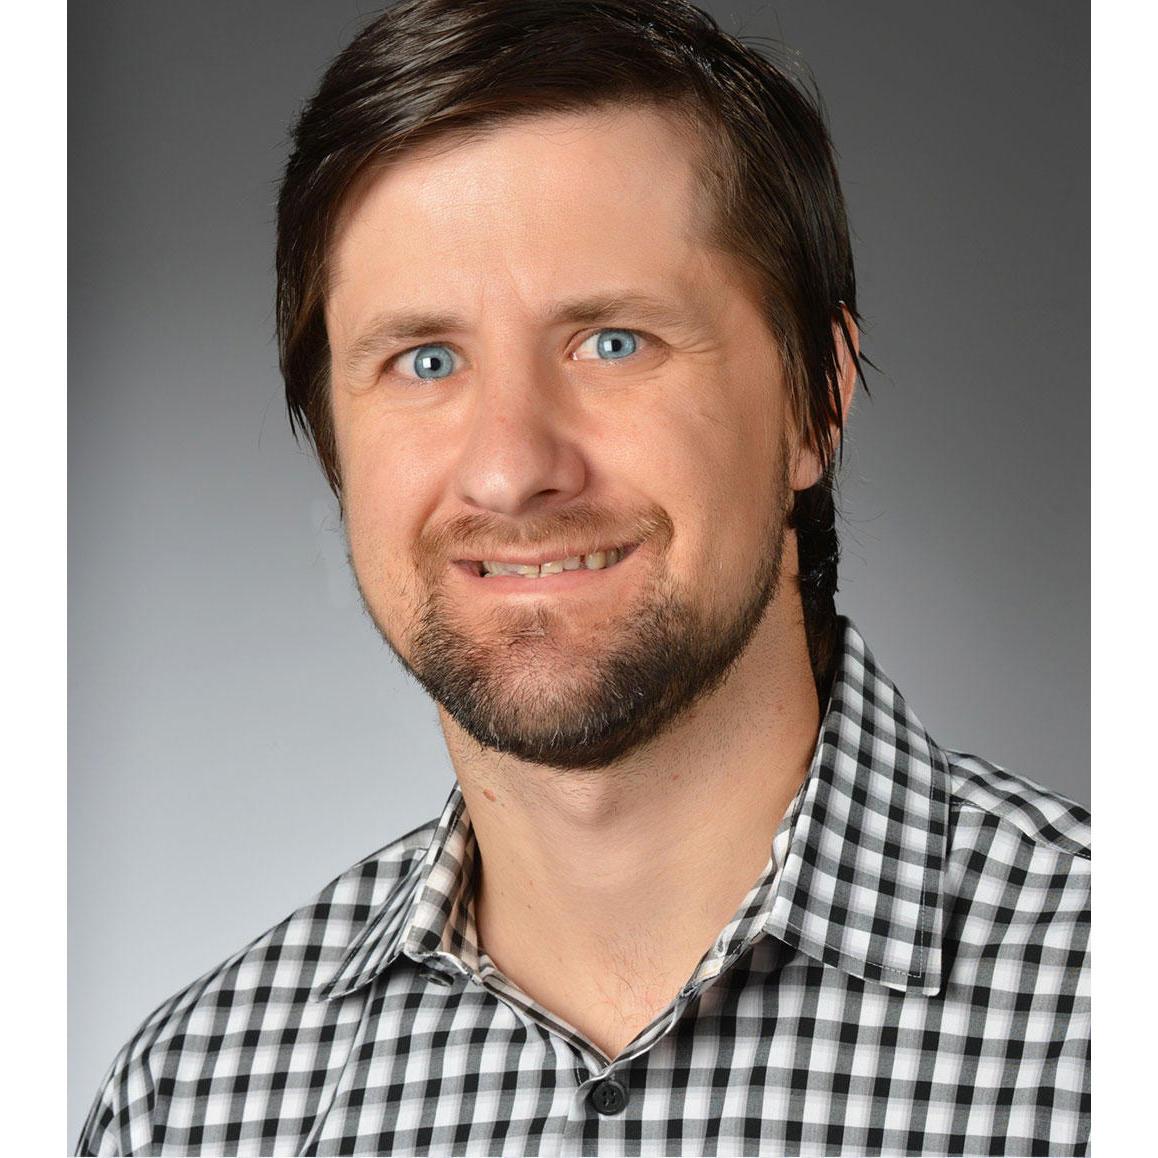 Headshot of Justin Smith